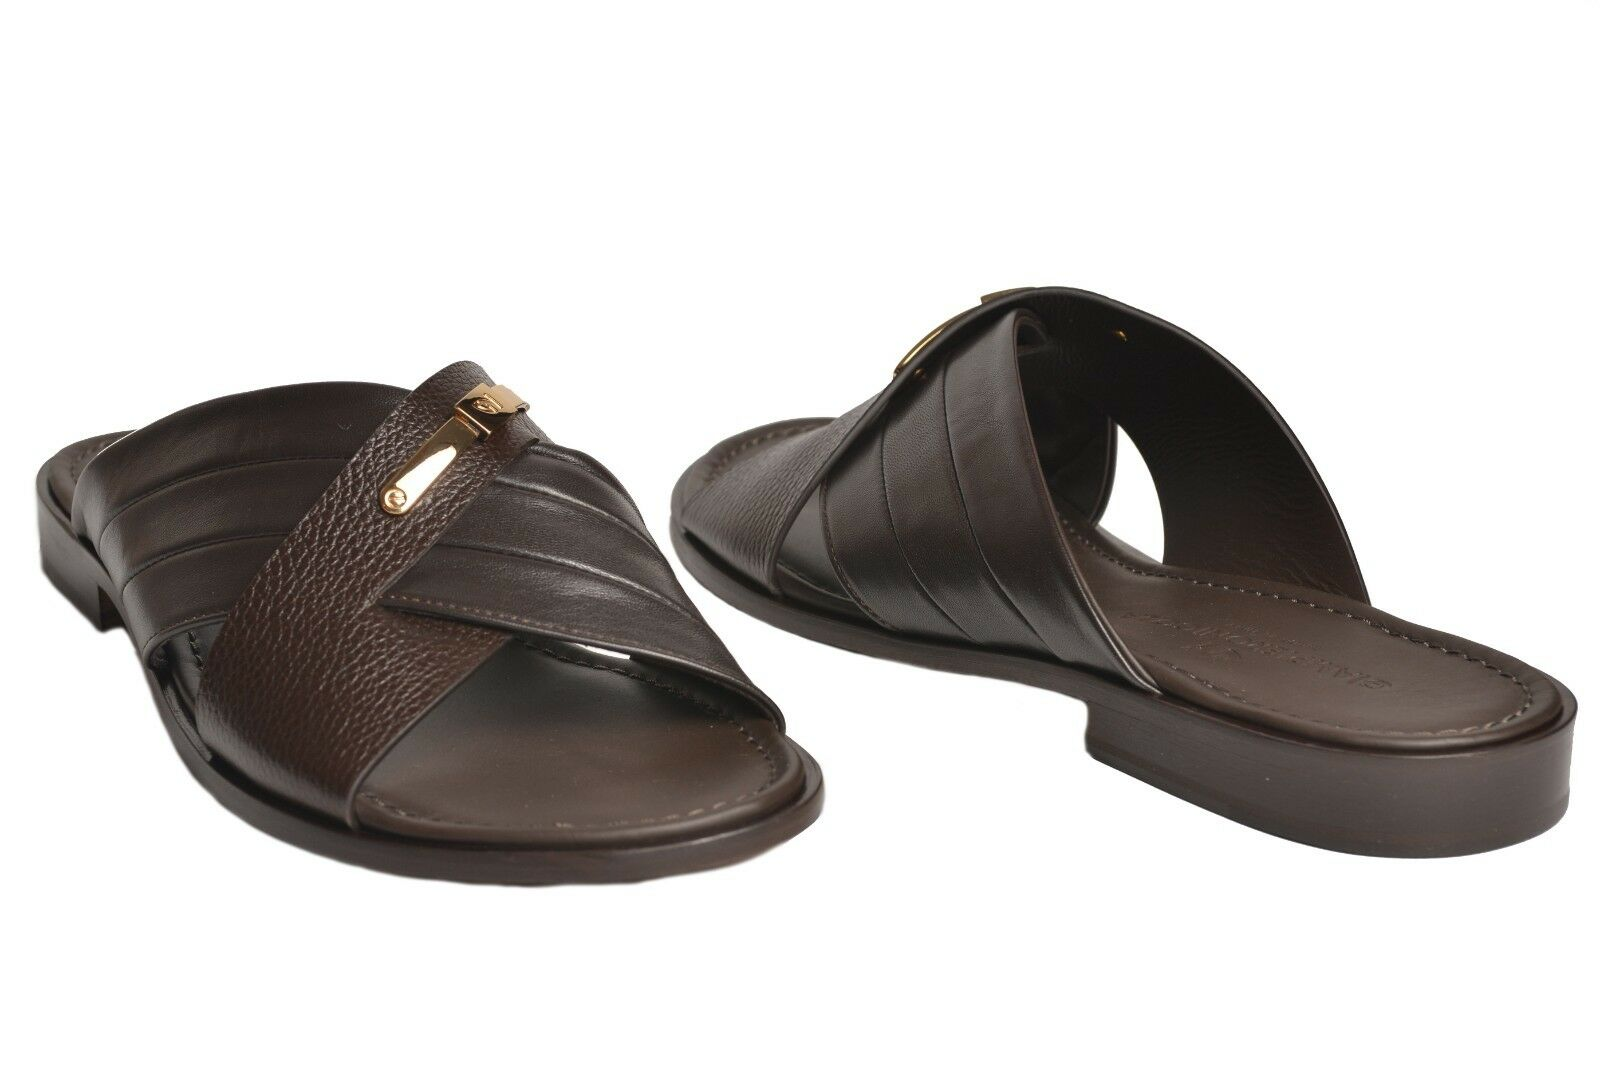 Giampieronicola 5538 italian mens brown leather criss cross sandals